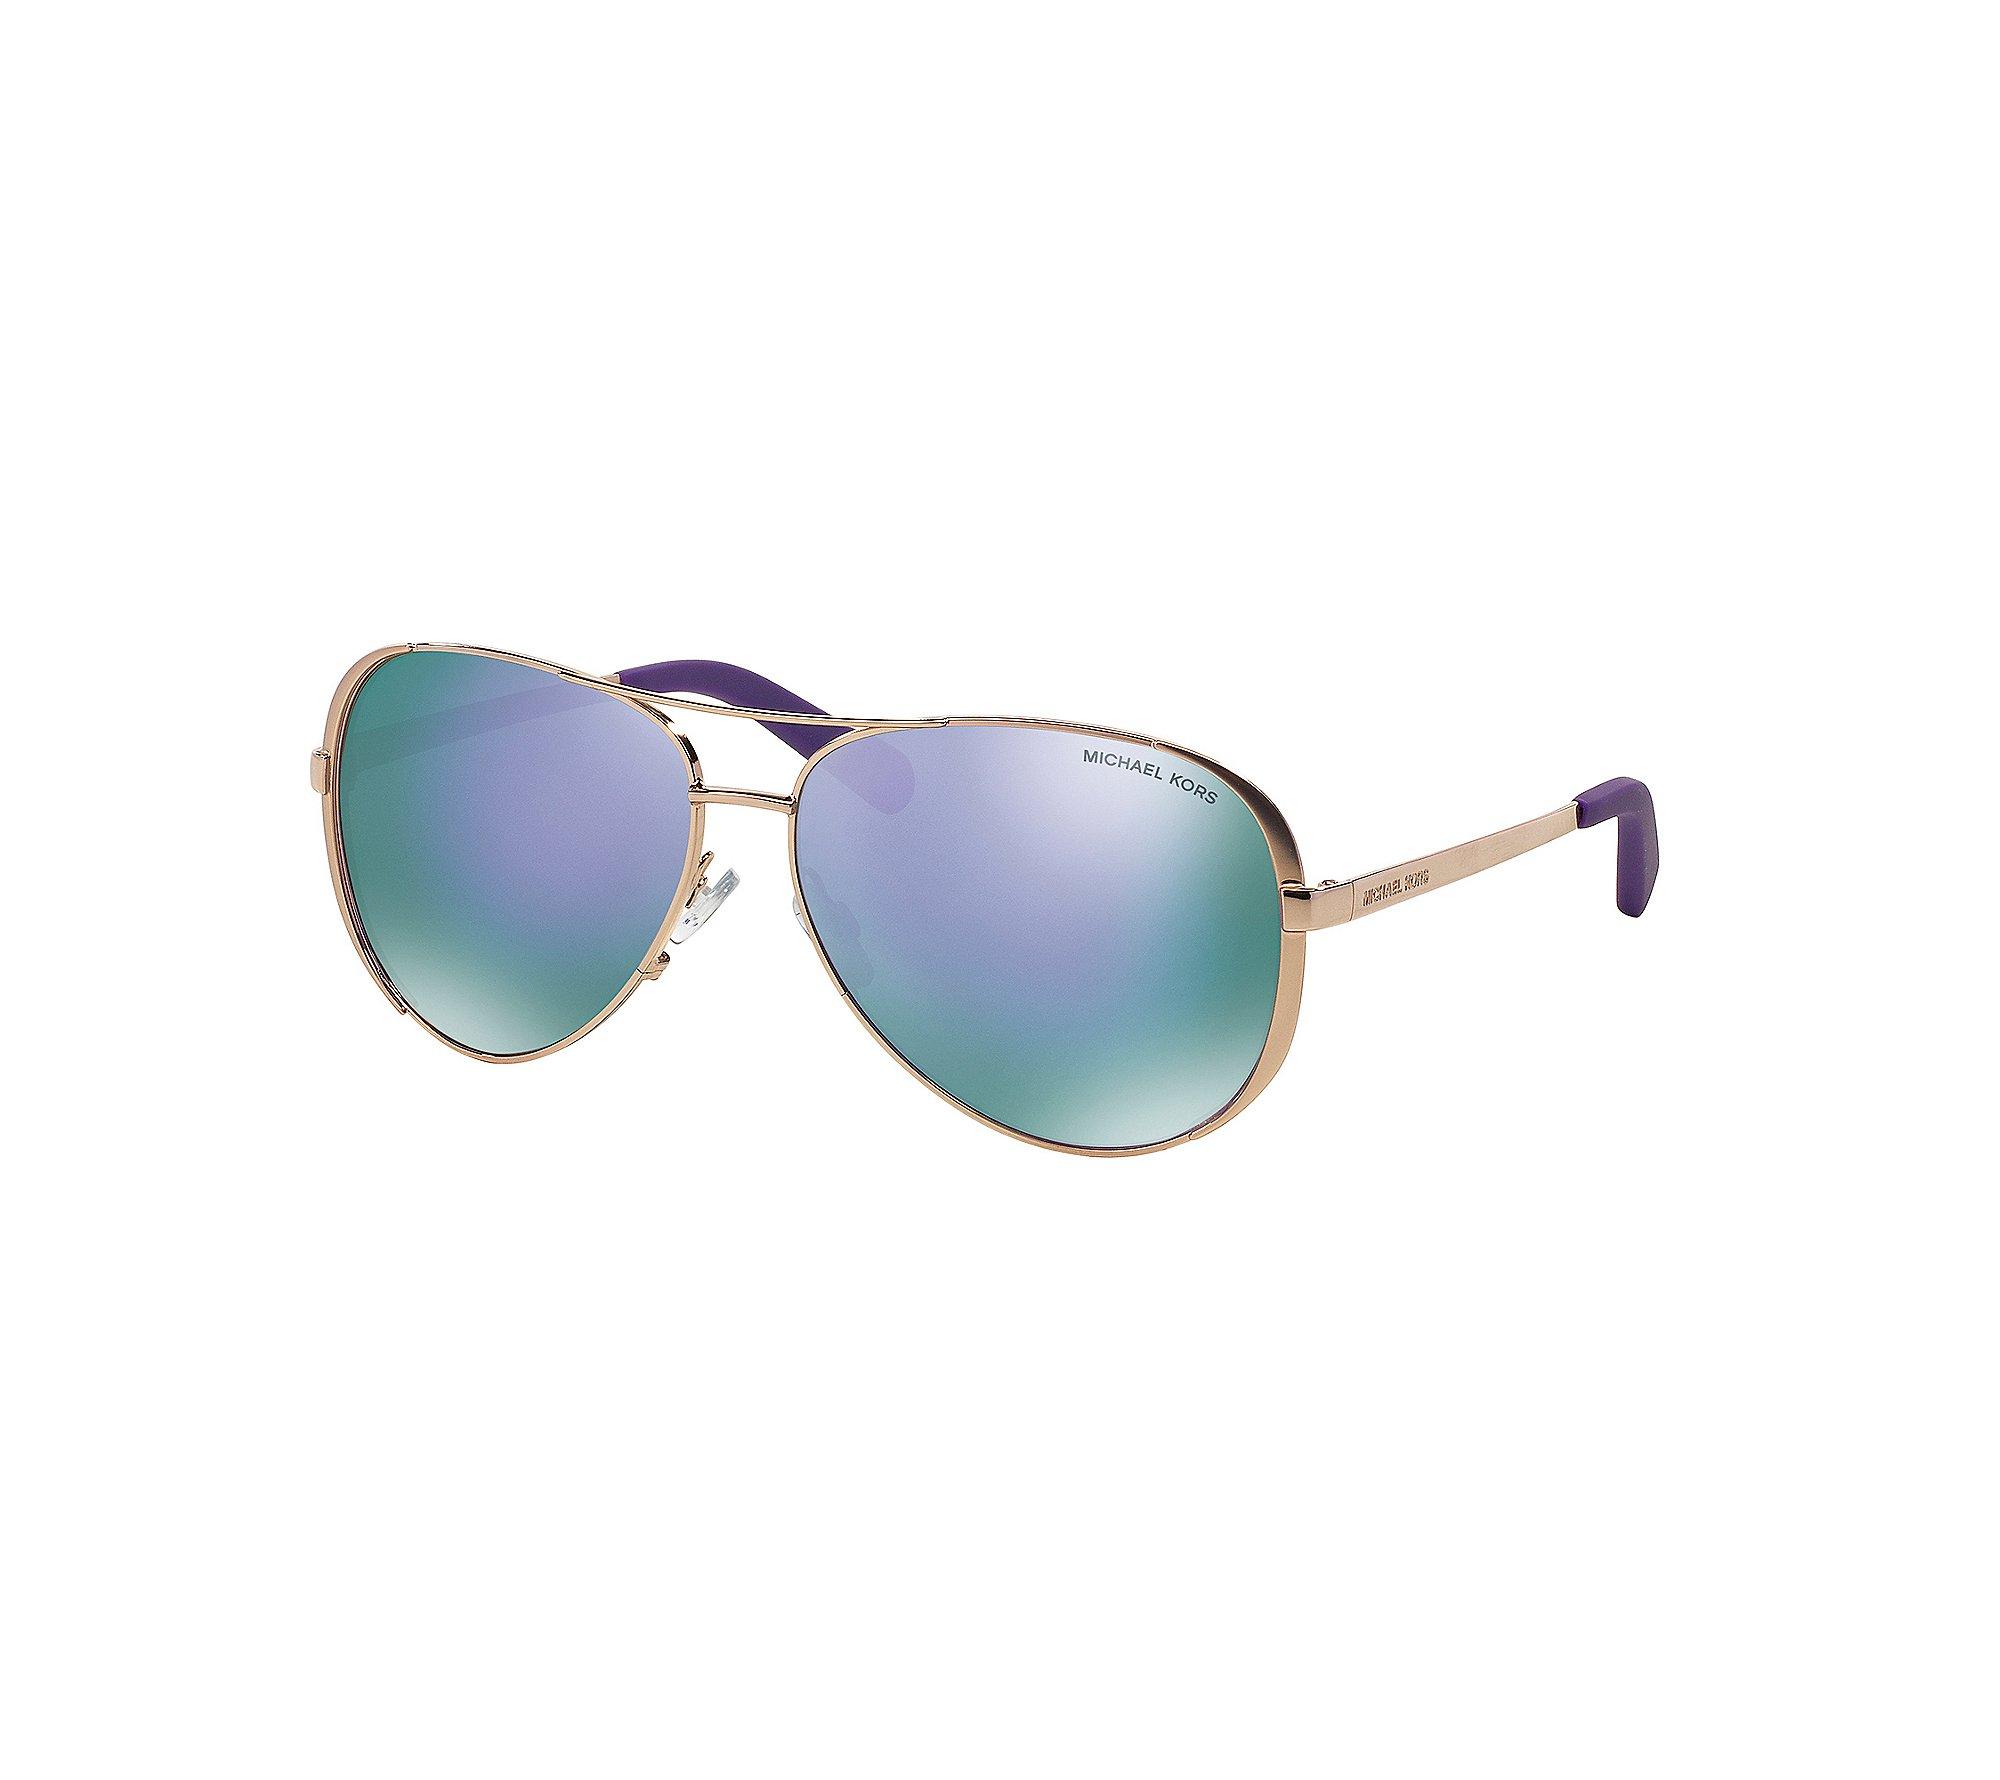 Michael-Kors-Chelsea-Aviator-Sunglasses